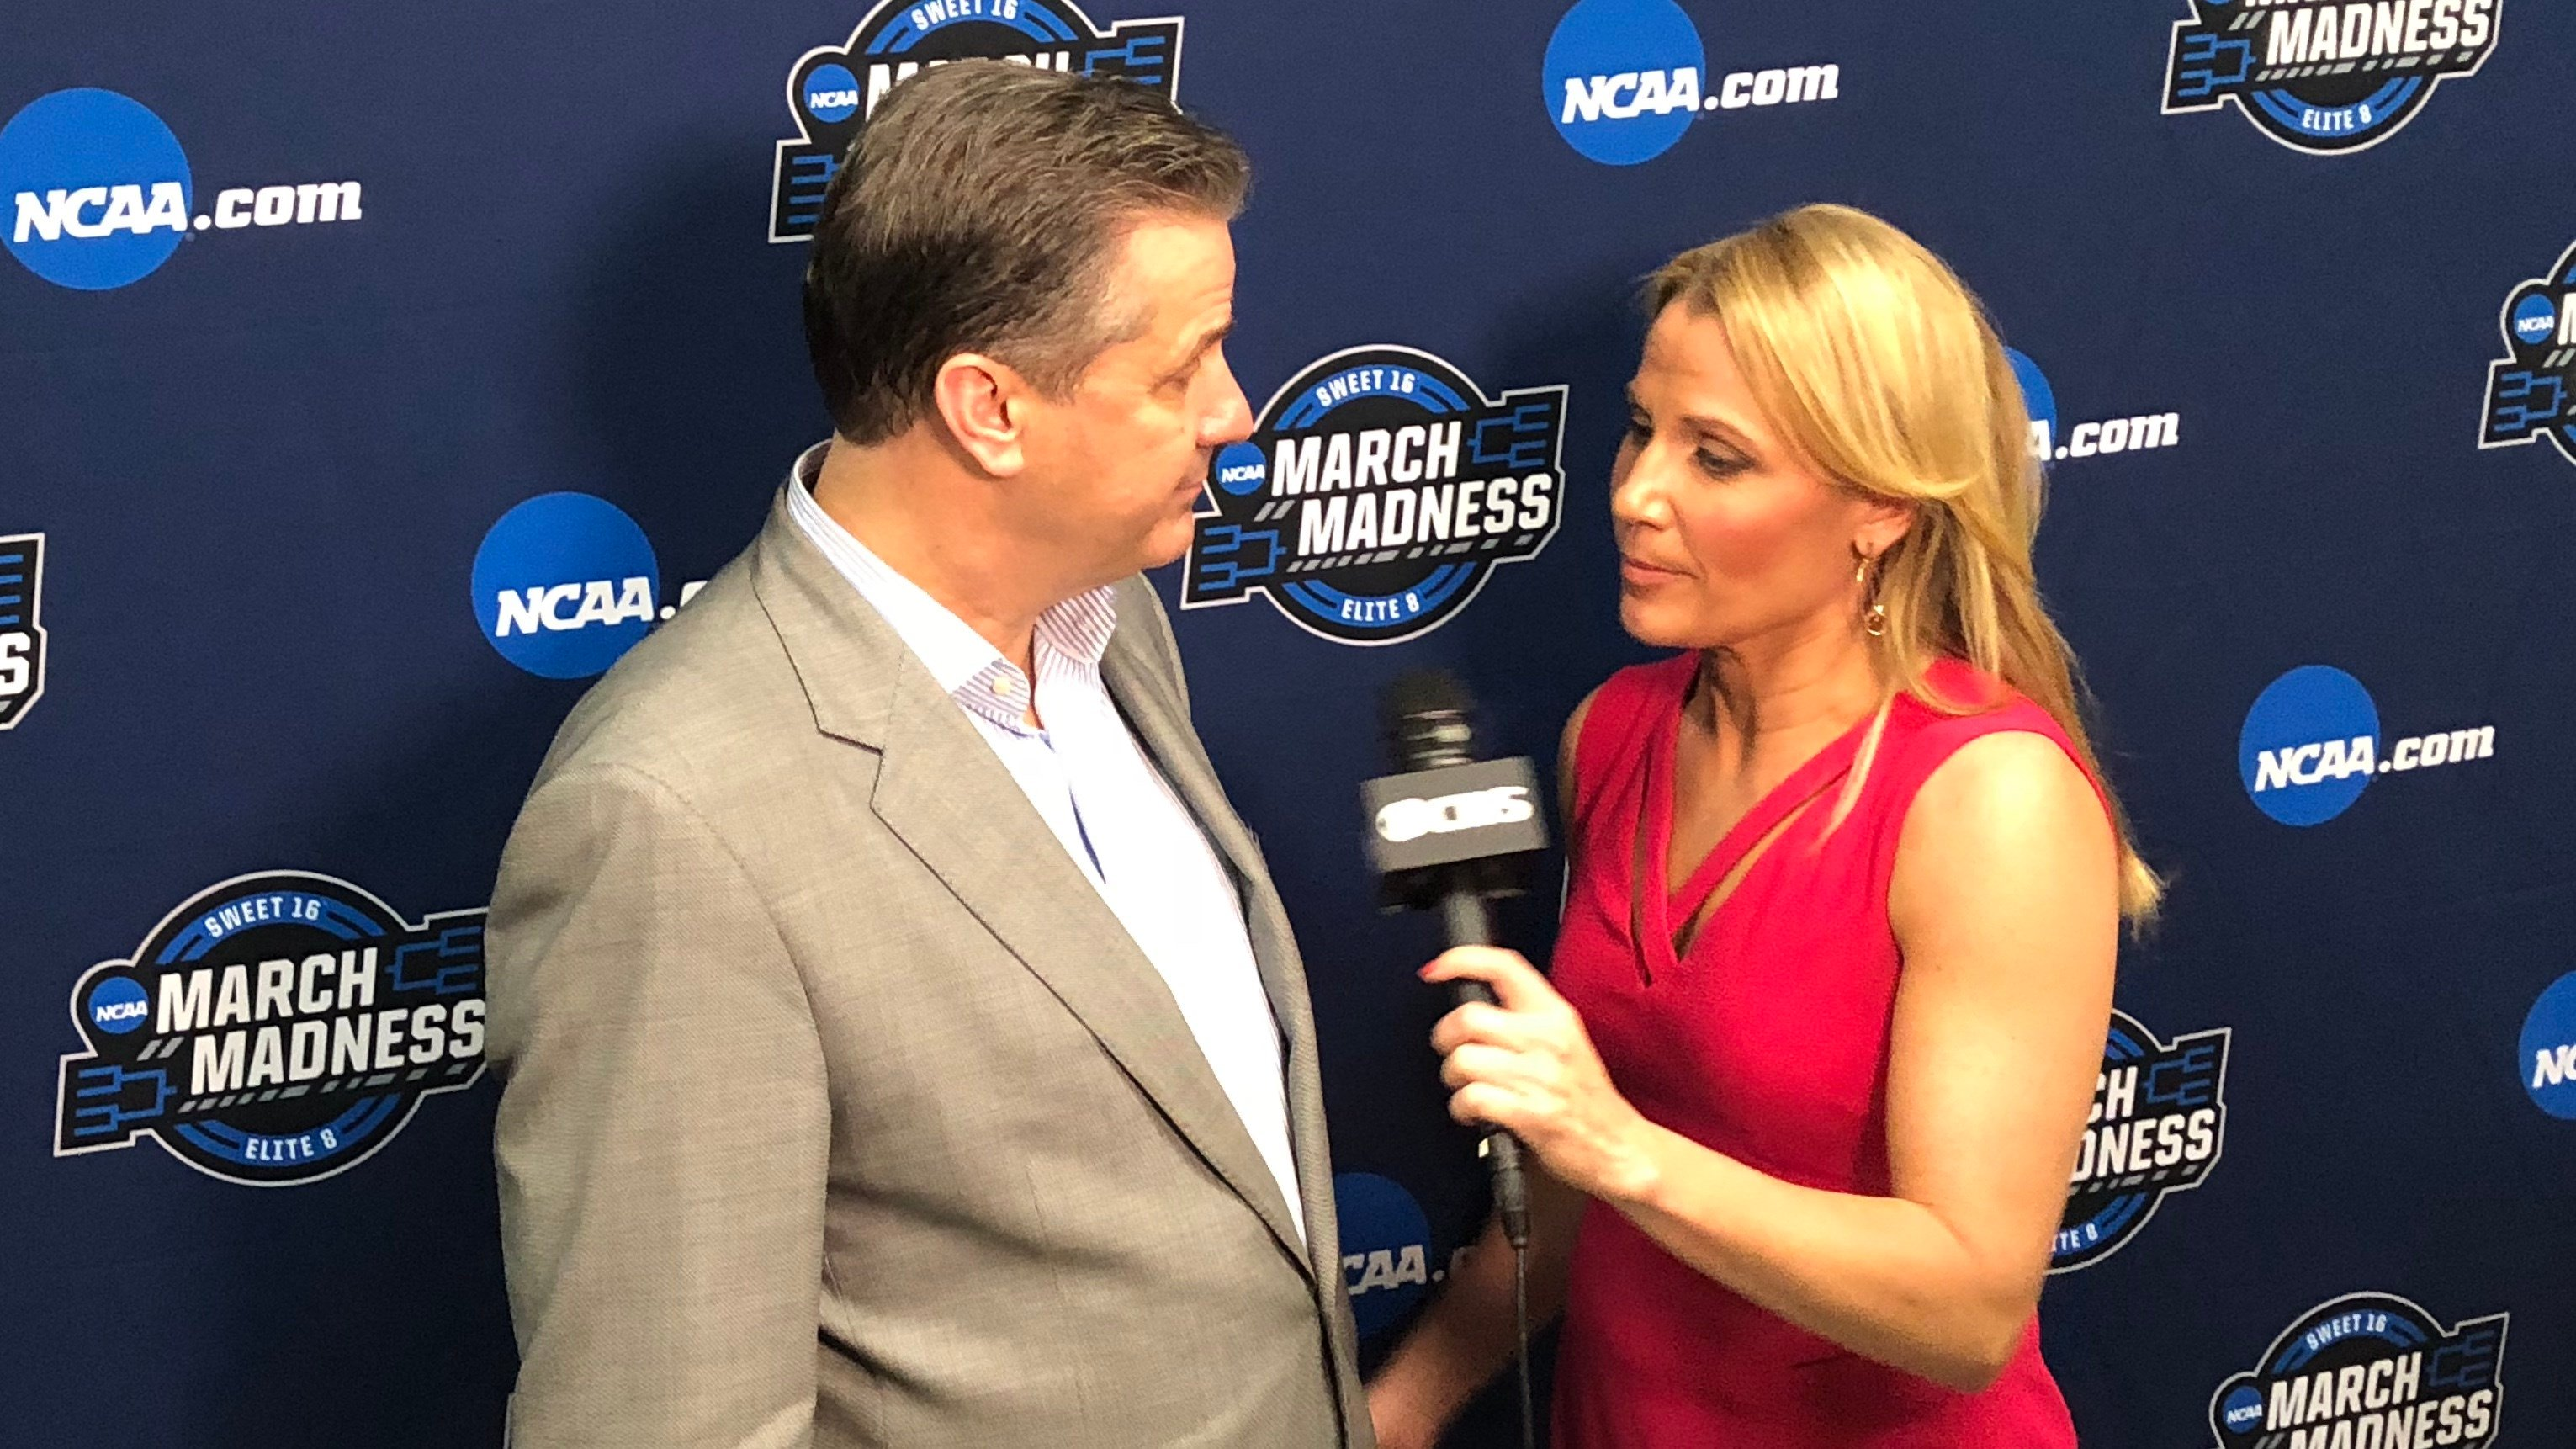 John Calipari explained Kentucky's loss to Kansas State to Lisa Byington of CBS after the game.